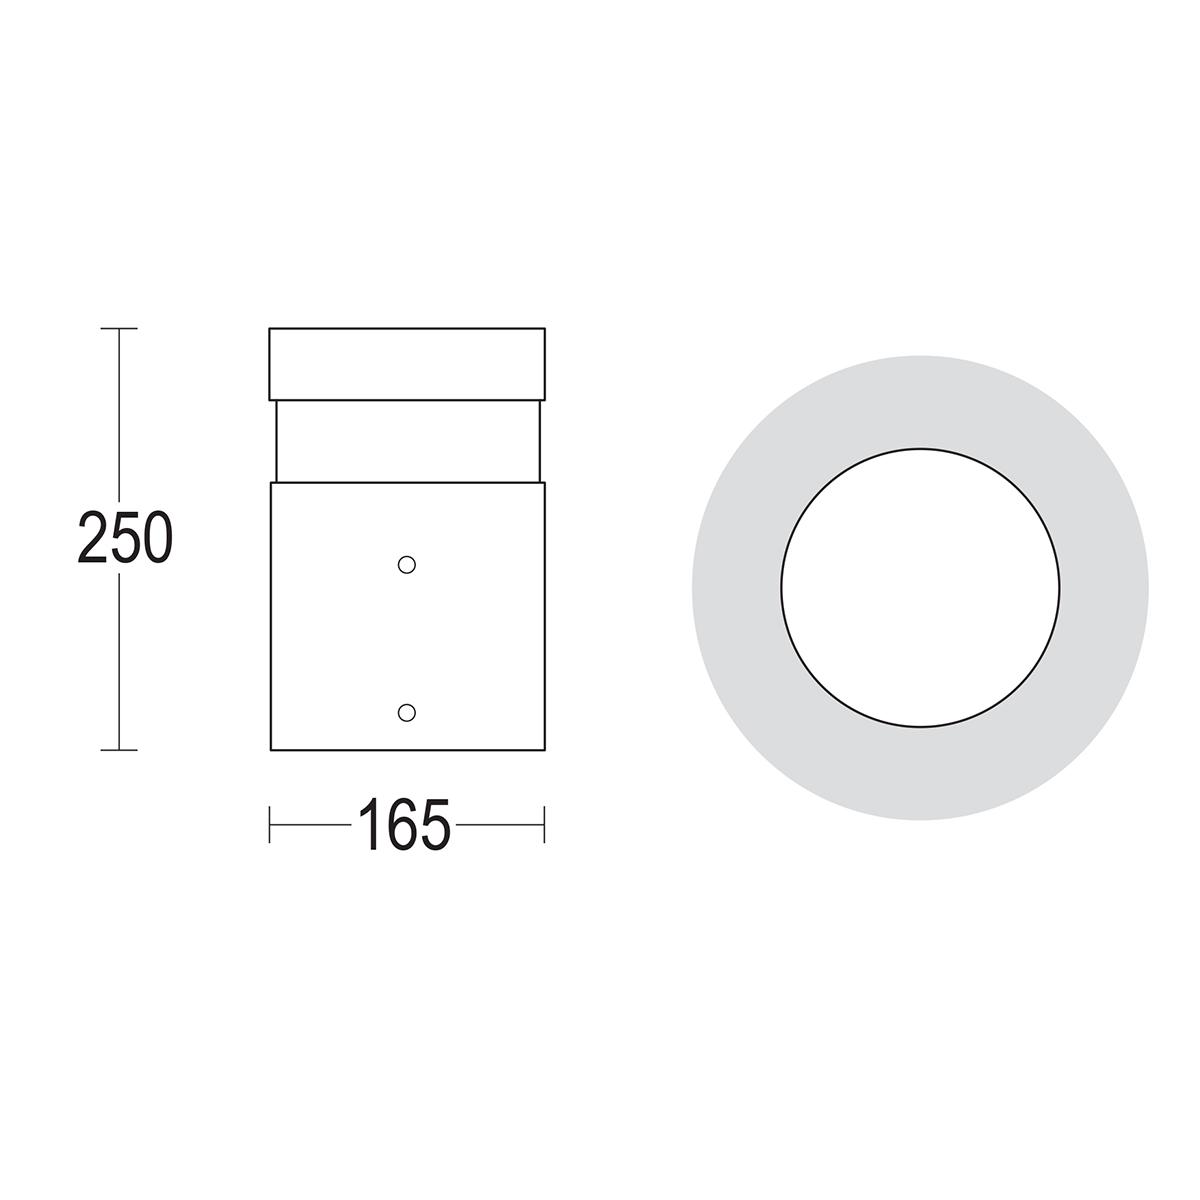 чертеж Maxitondo 250 Ghidini уличный светильник GH1203.FAXT300EN